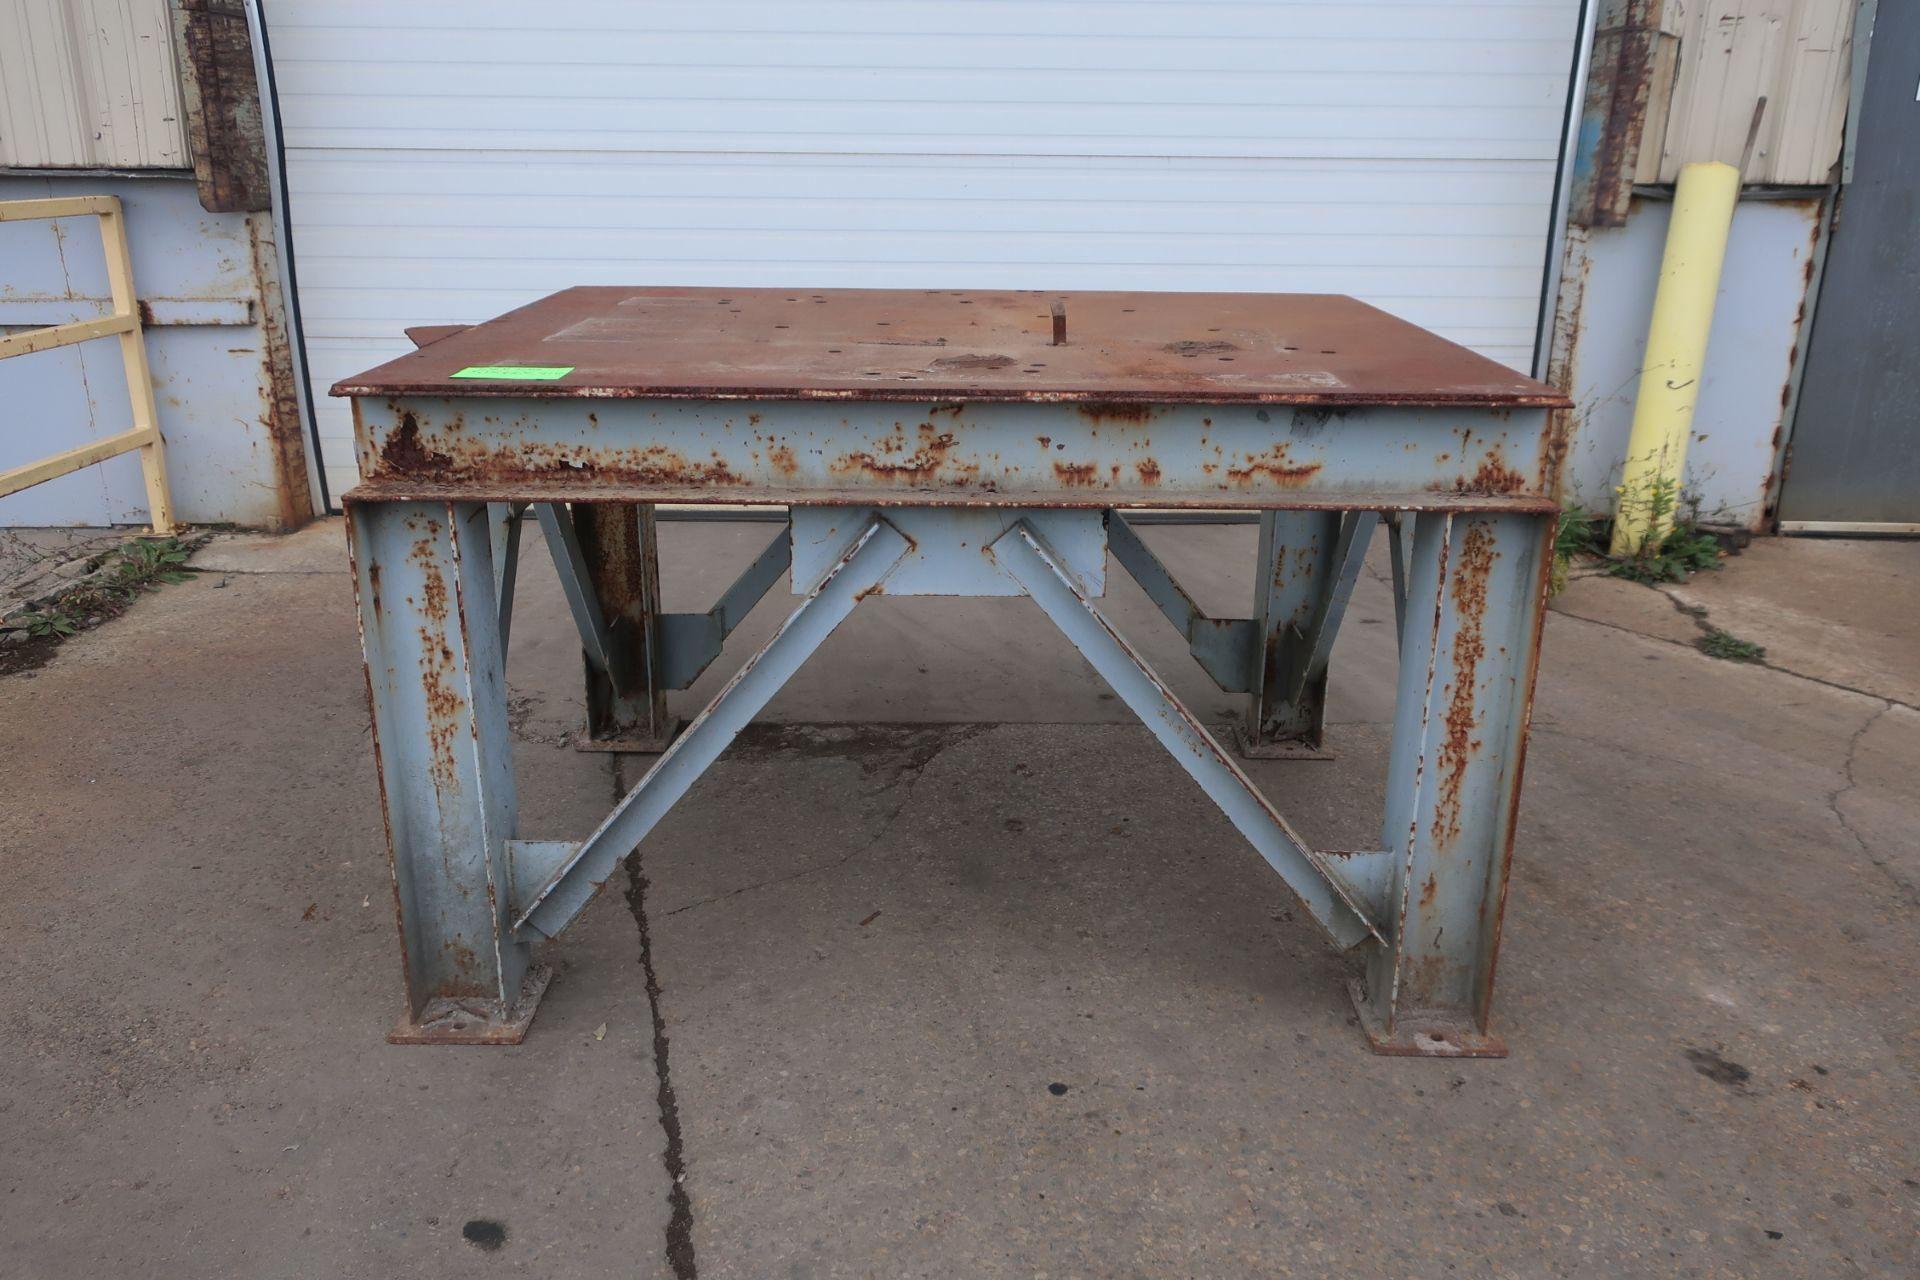 "Industrial Heavy Duty Work Table - 51 x 66 x 41"" tall"